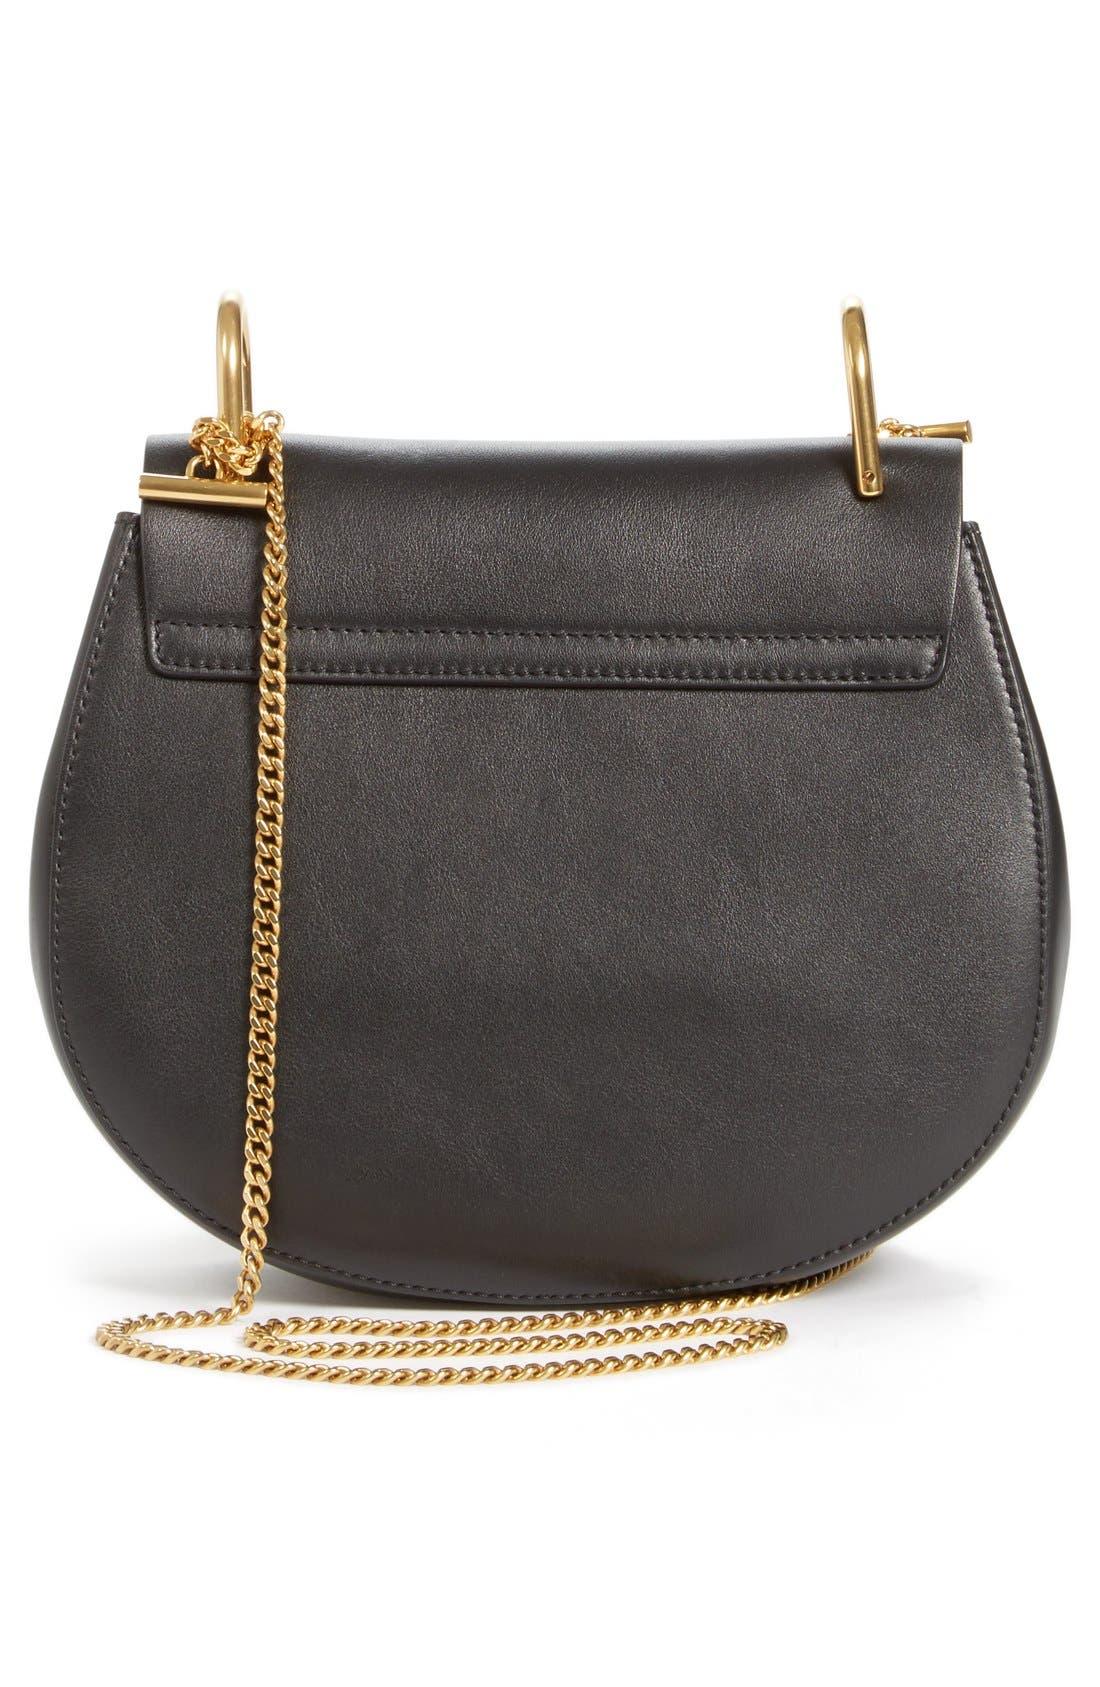 Alternate Image 3  - Chloé 'Small Drew' Wonder Woman Patchwork Suede & Leather Shoulder Bag